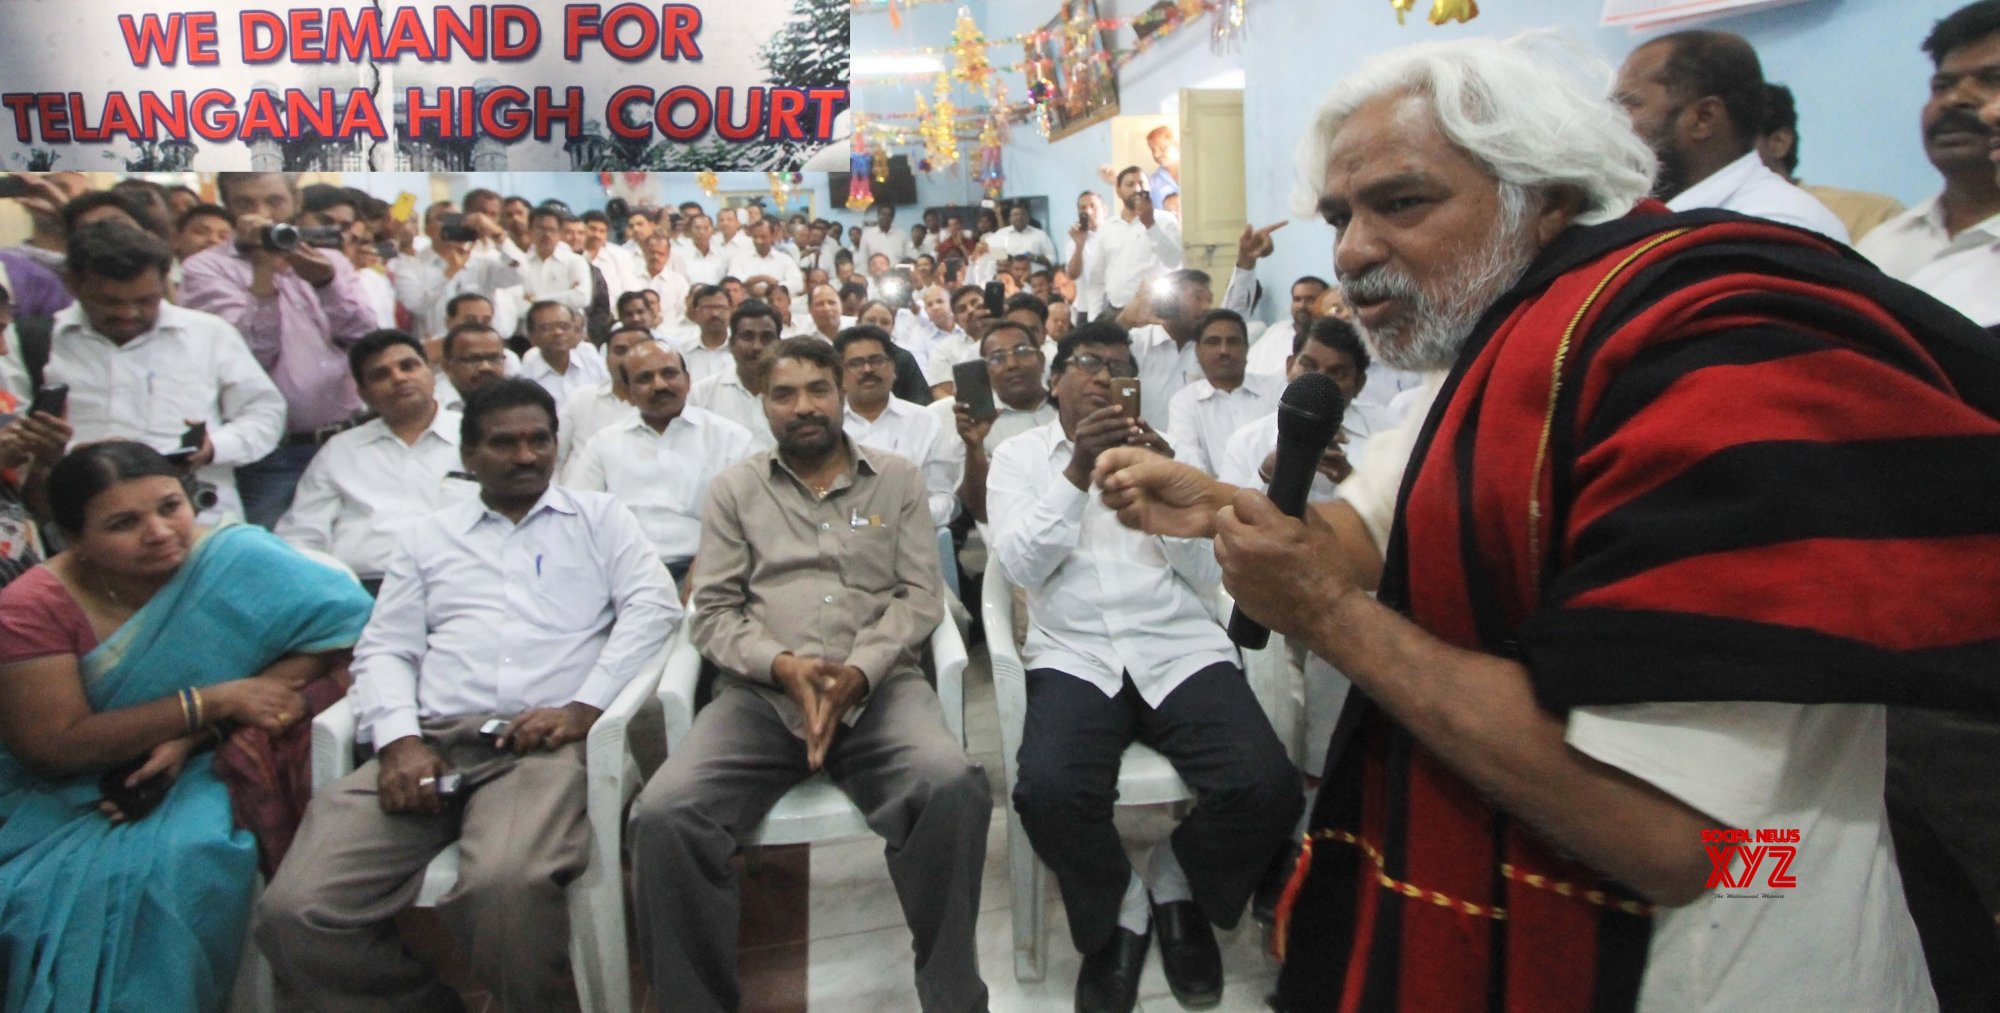 Ex-Maoist ideologue votes in Telangana